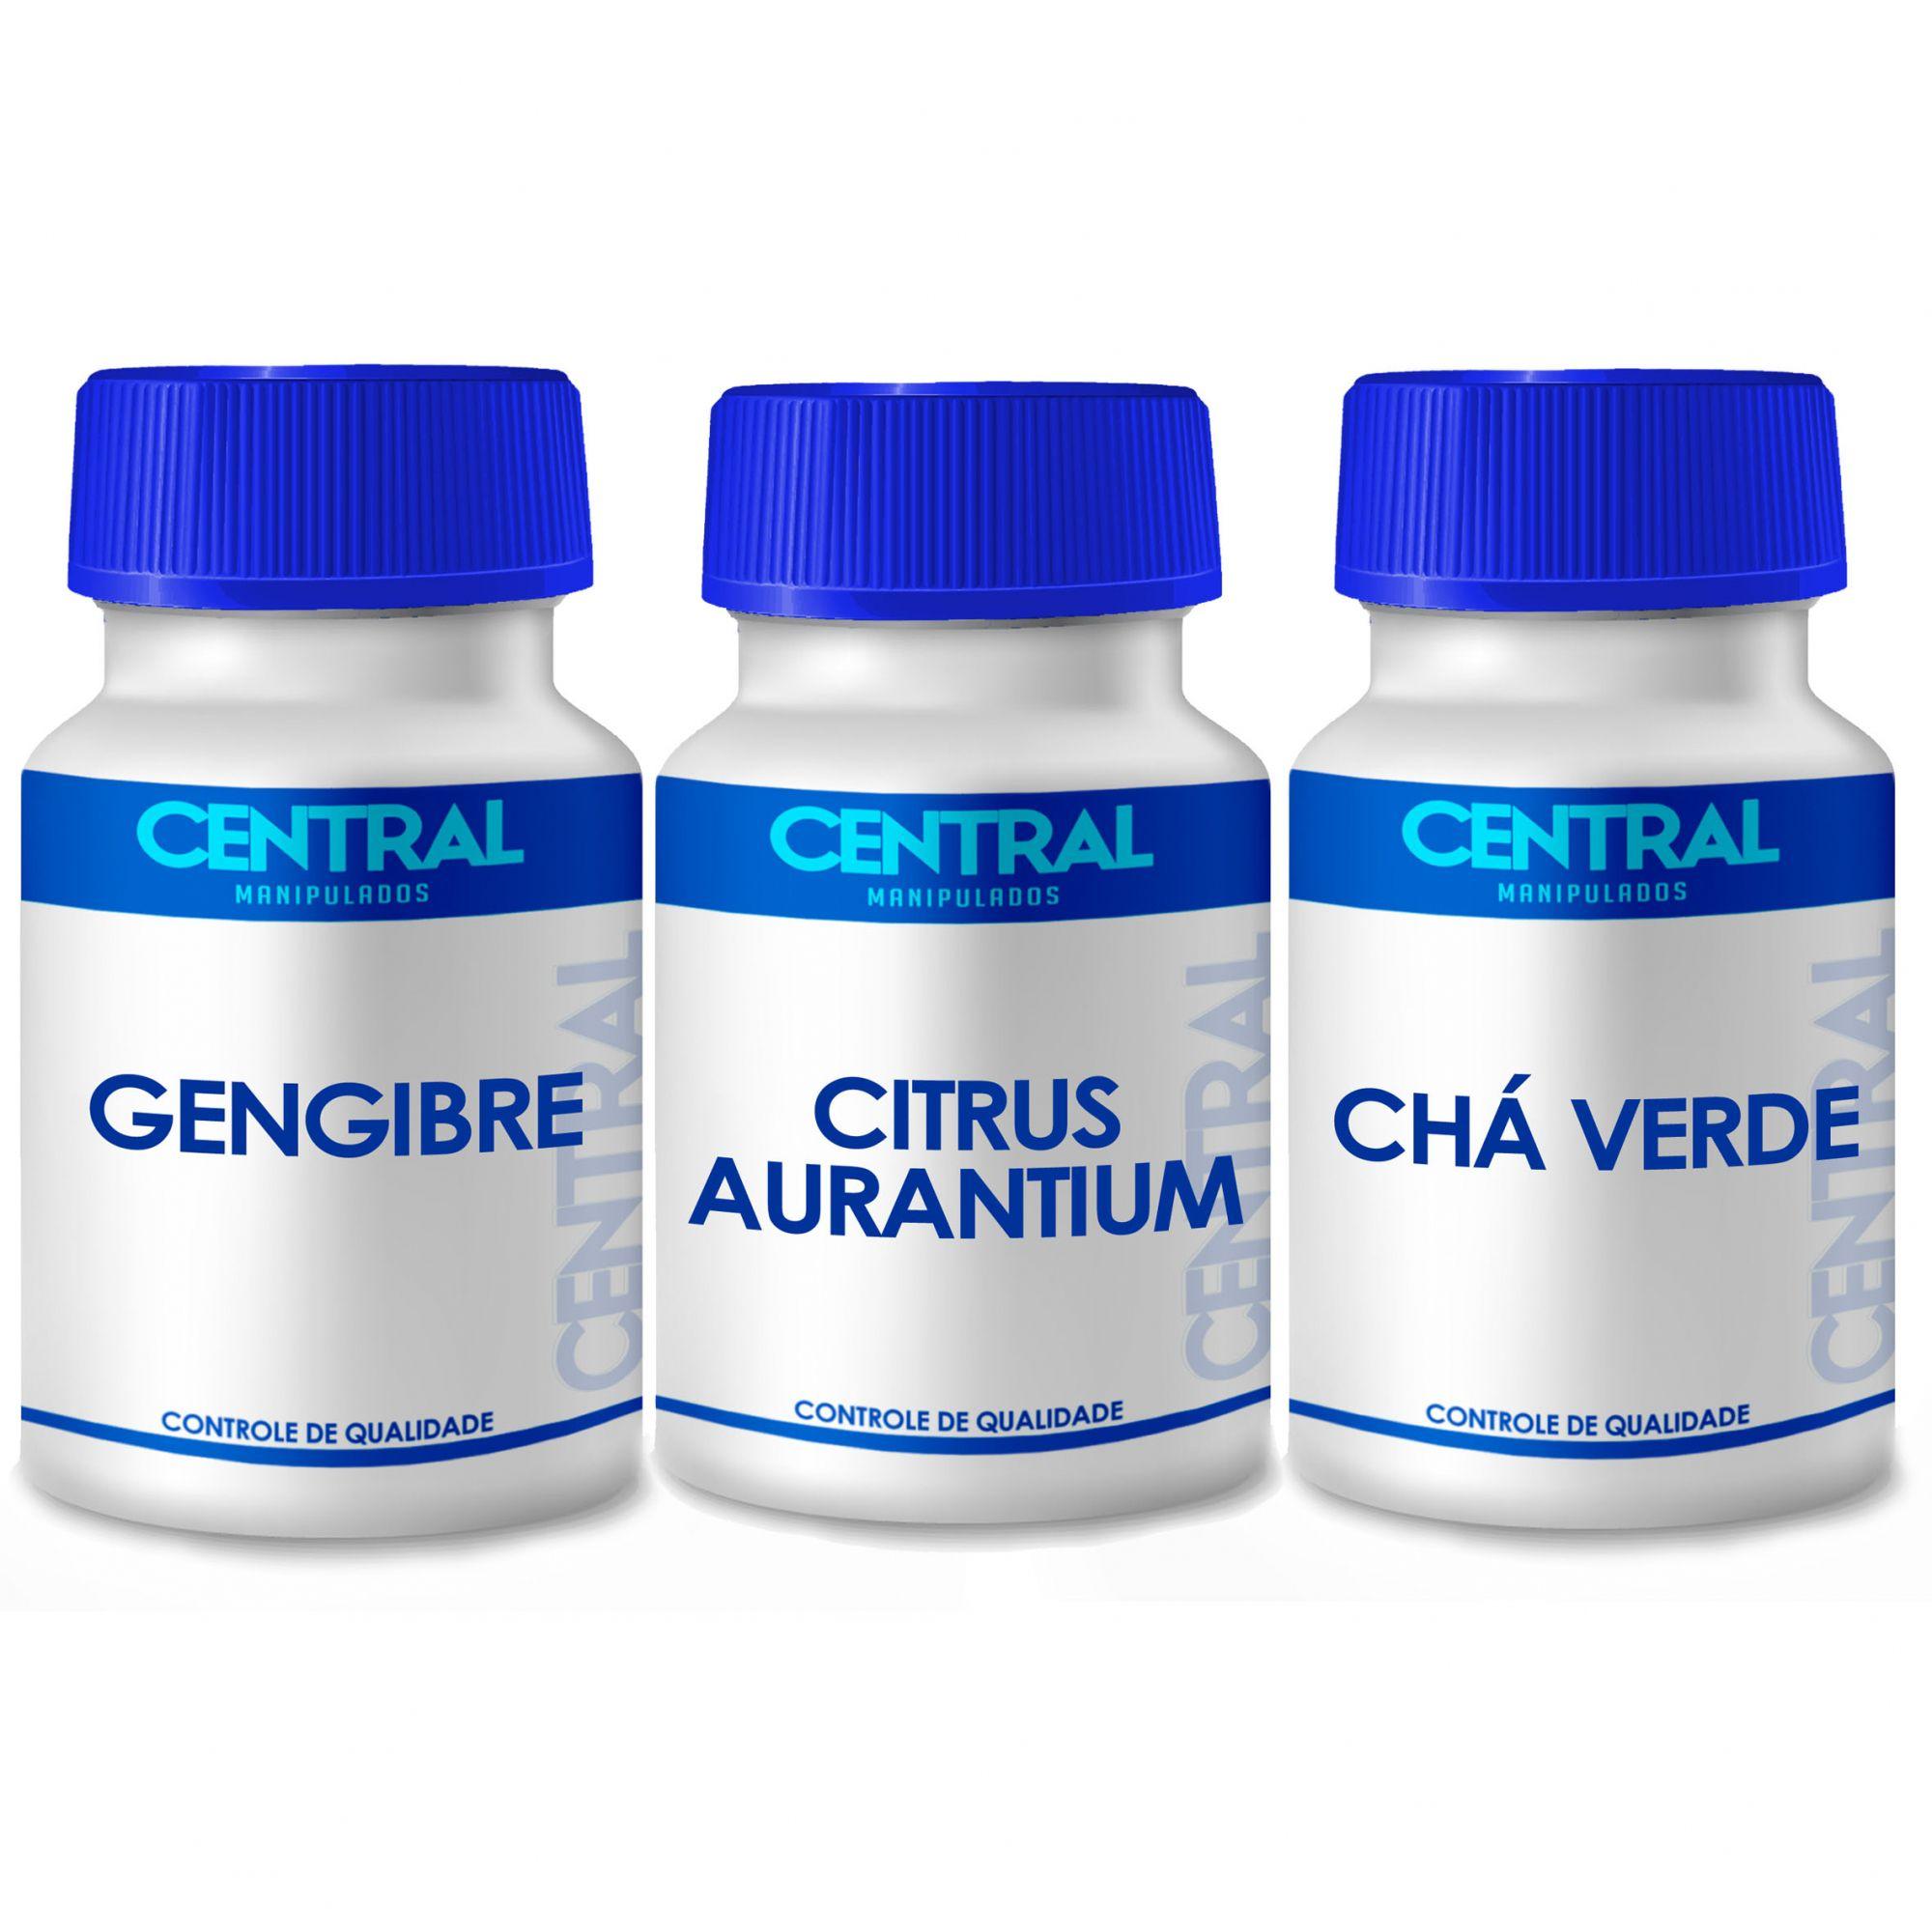 Gengibre + Citrus Aurantium + Chá verde